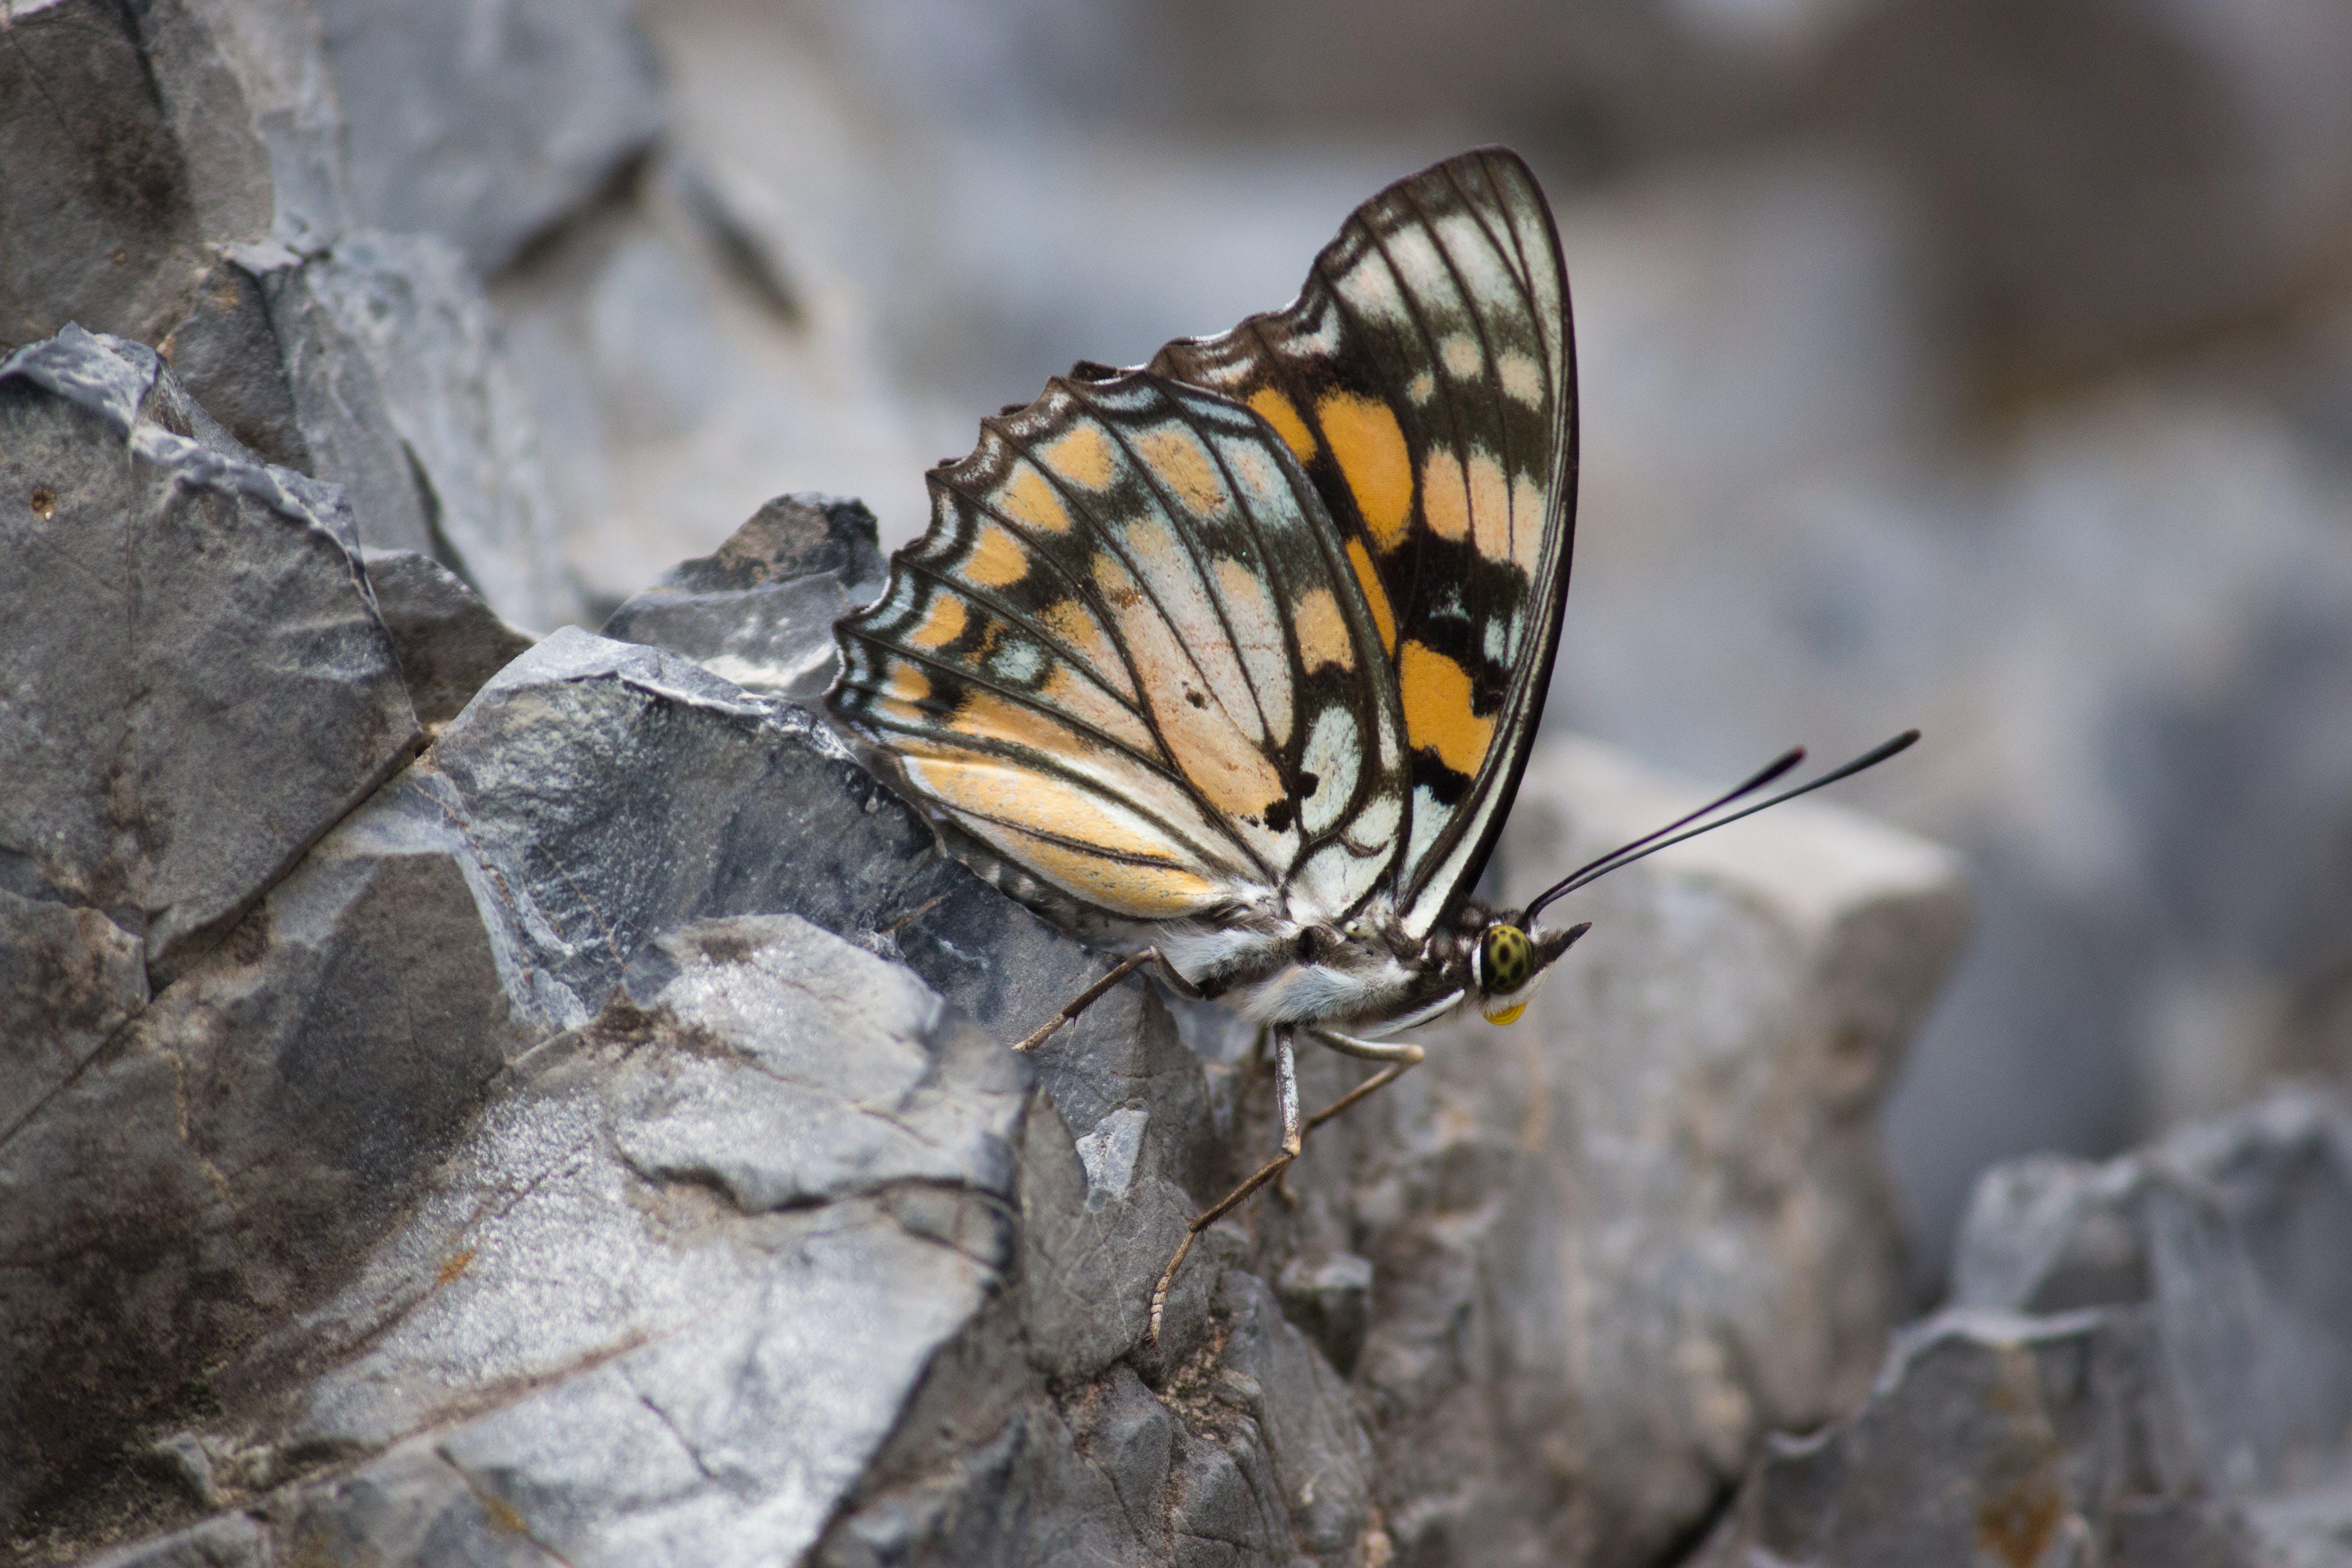 Gratis stockfoto met #butterfly #butterflies #inspiration, #butterflyart, #colorful #natureonly #naturelovers, #macro #macofhotography